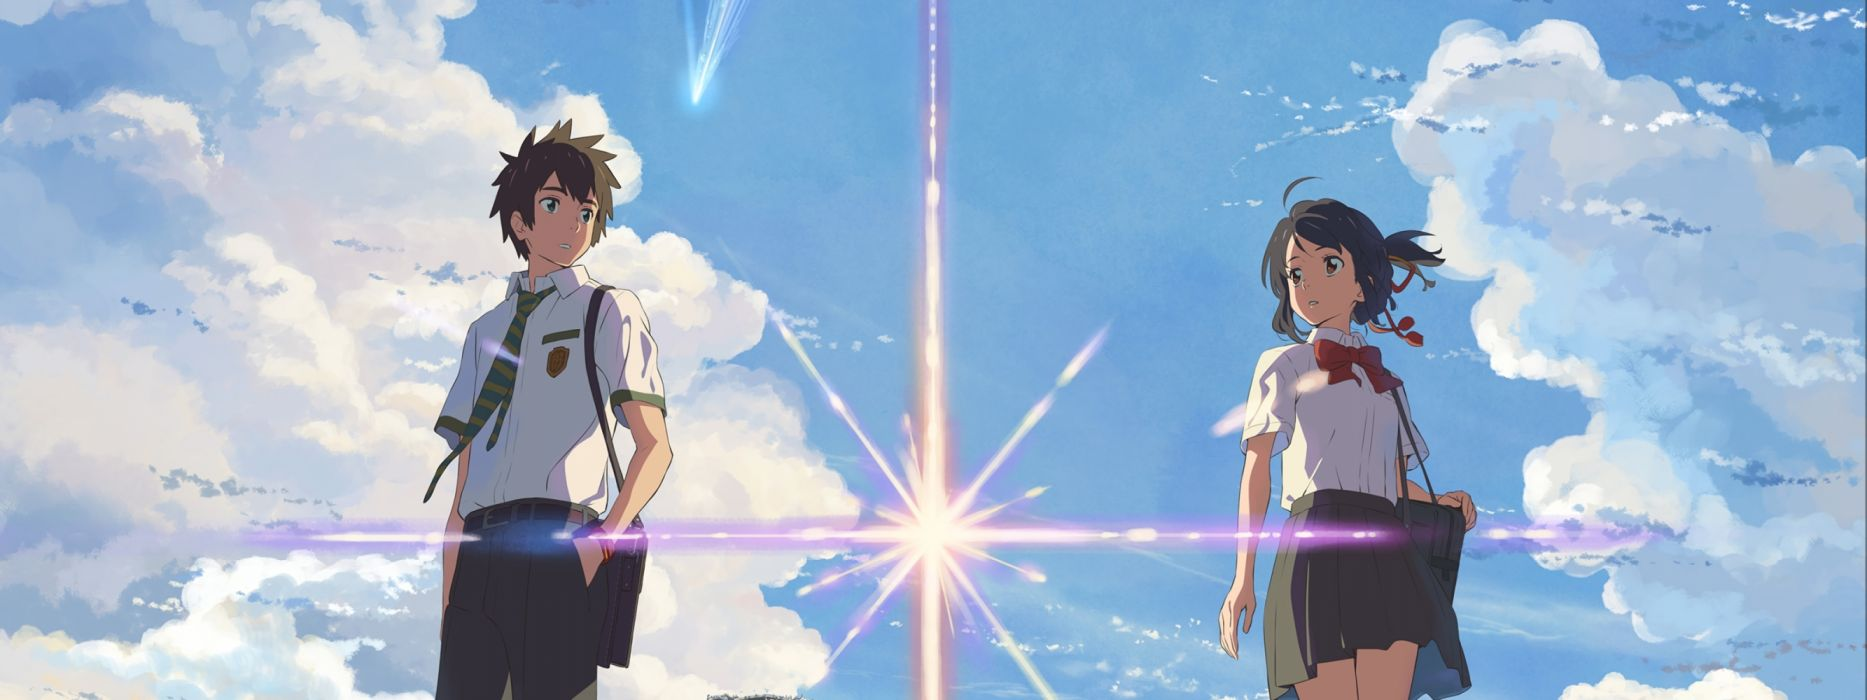 Kell Ok Hataran Anime Monitor Flgreenmovers Com